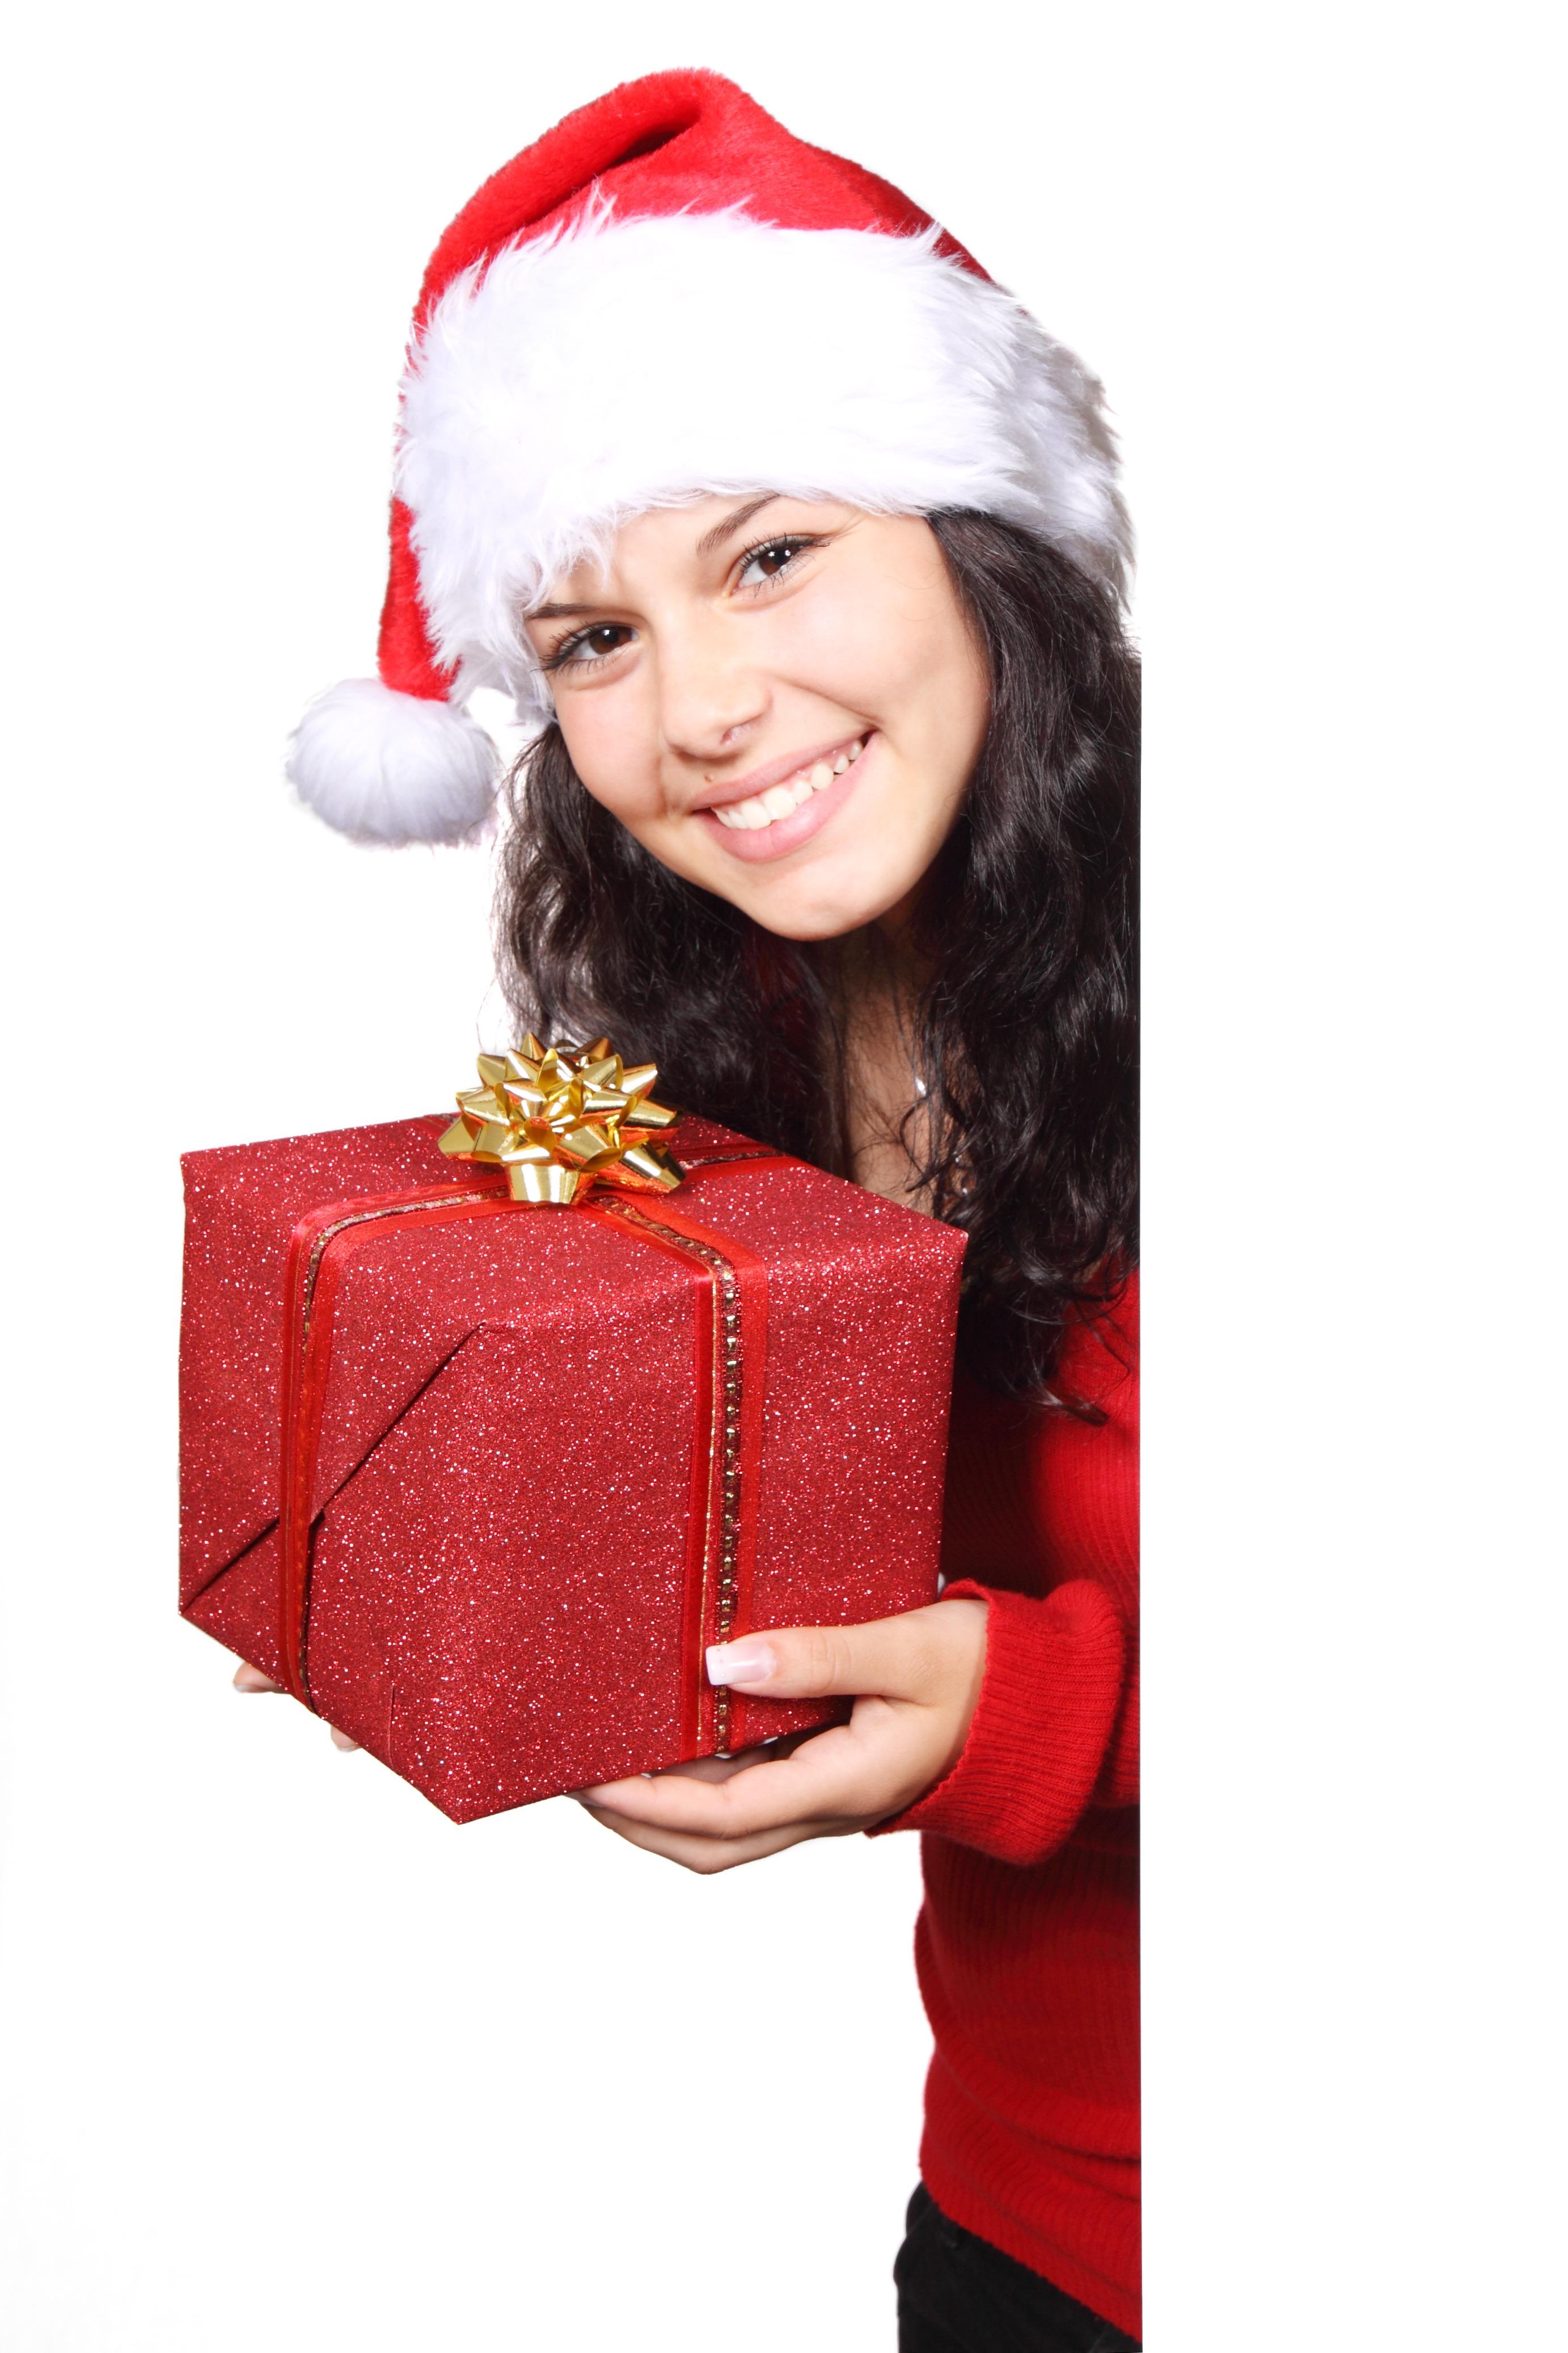 Girl with Box, Activity, Celebrate, Celebration, Christmas, HQ Photo